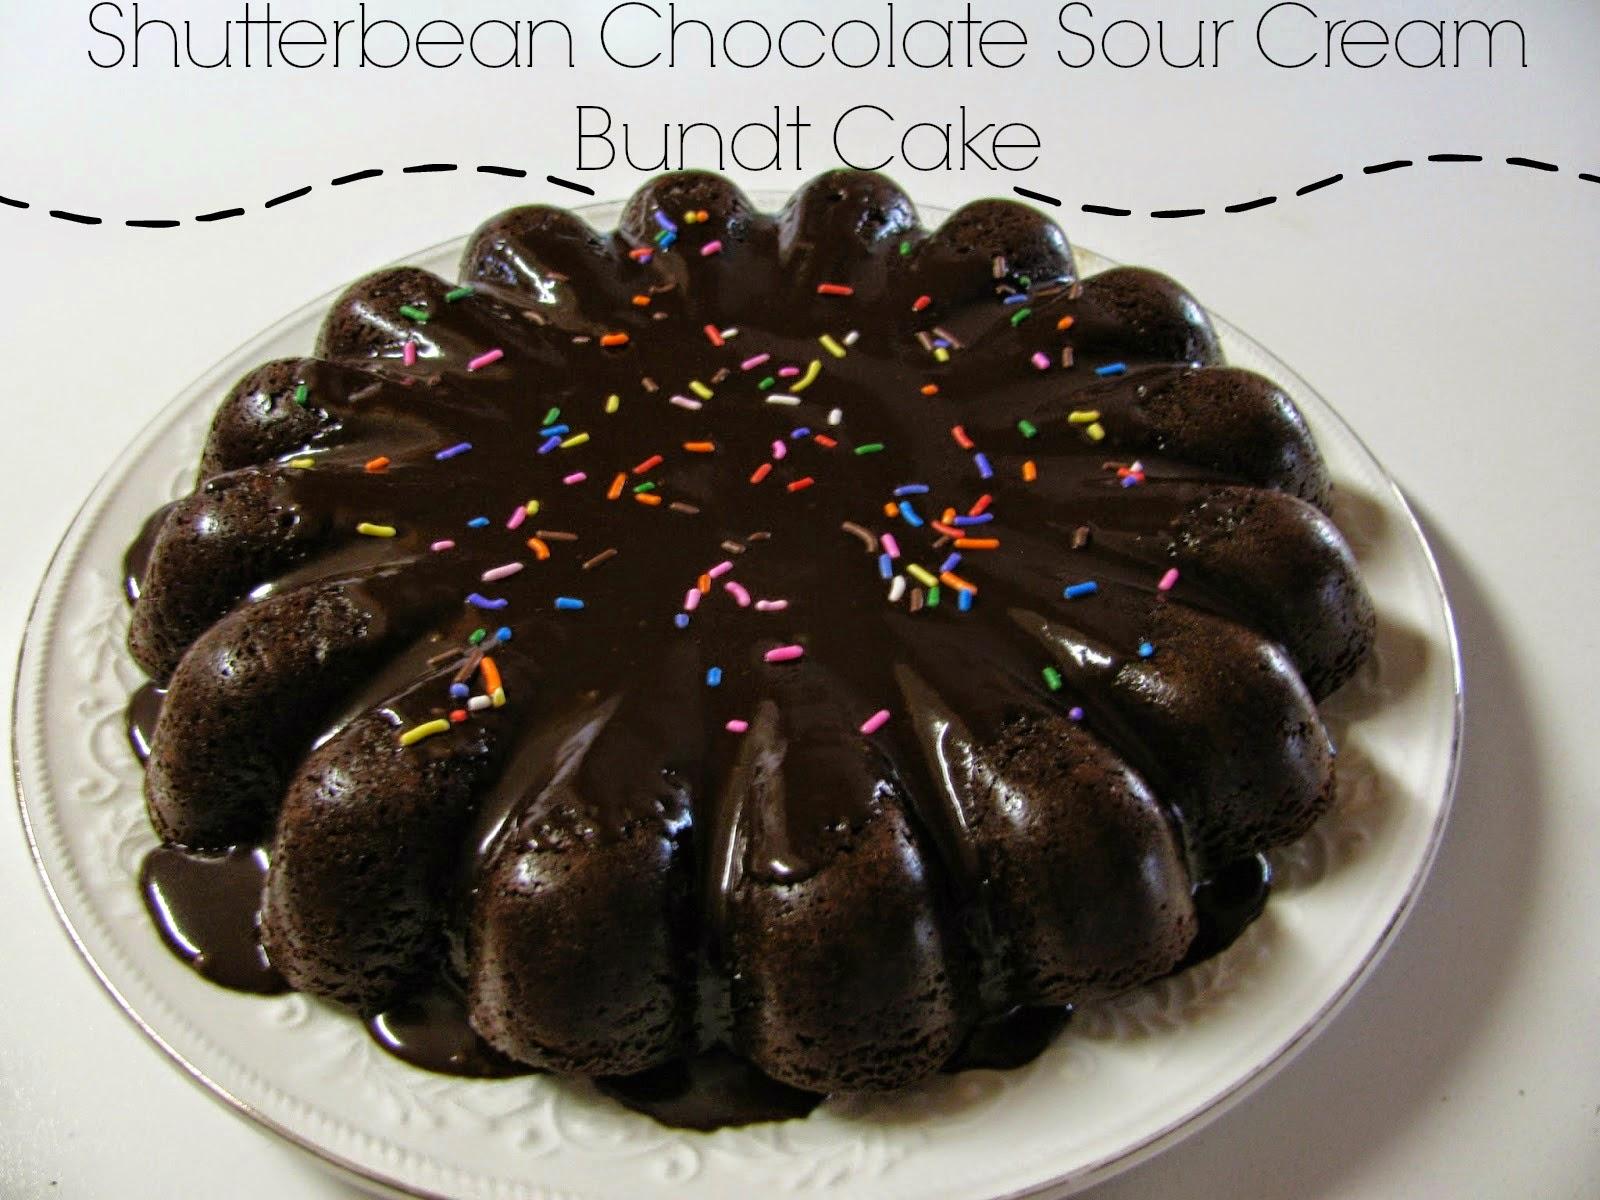 http://myjourneyforhim.blogspot.com/p/shutterbean-chocolate-sour-cream-bundt.html